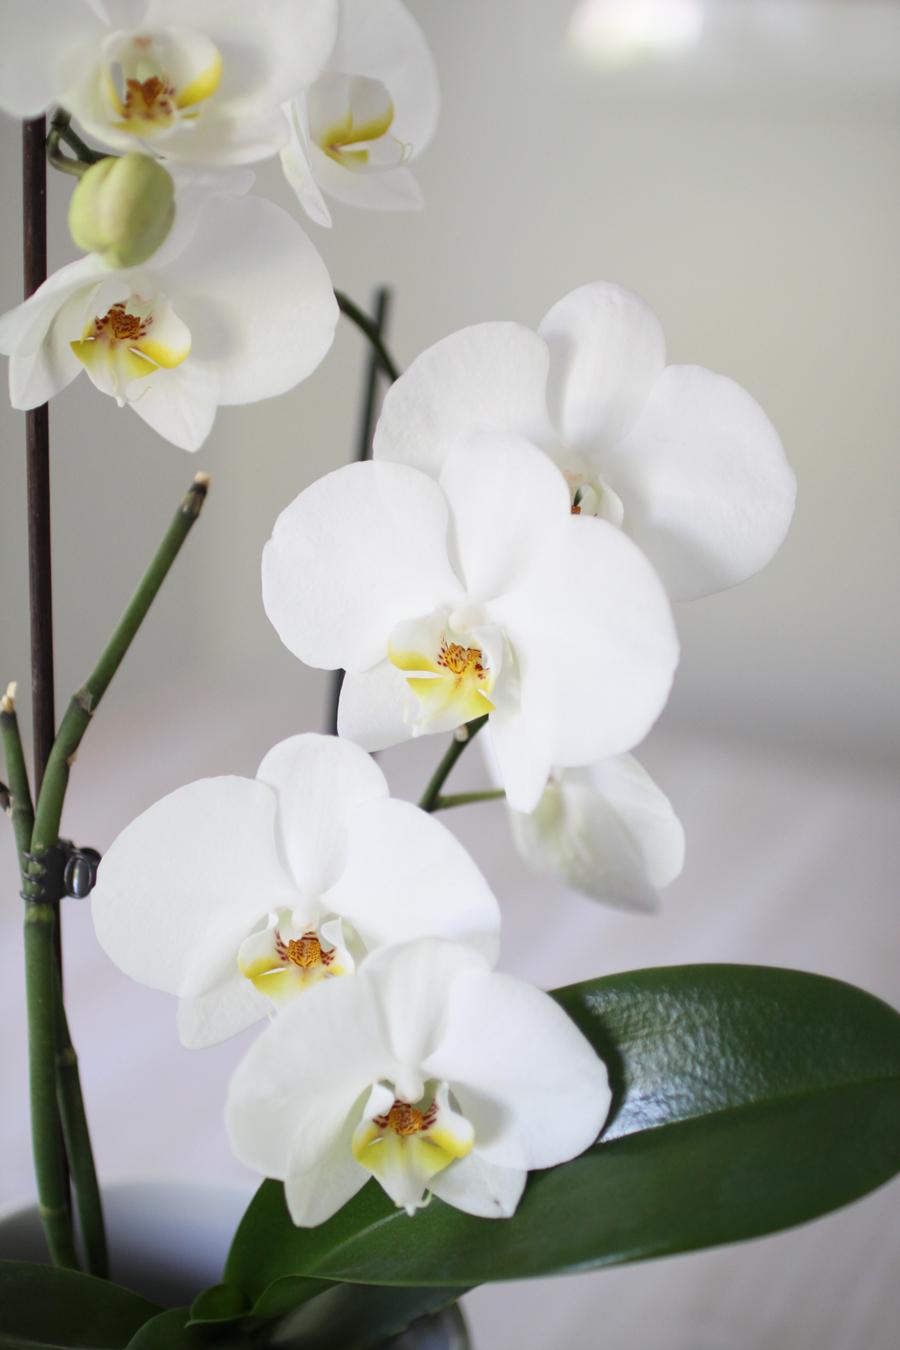 orkidea kukkii uudelleen